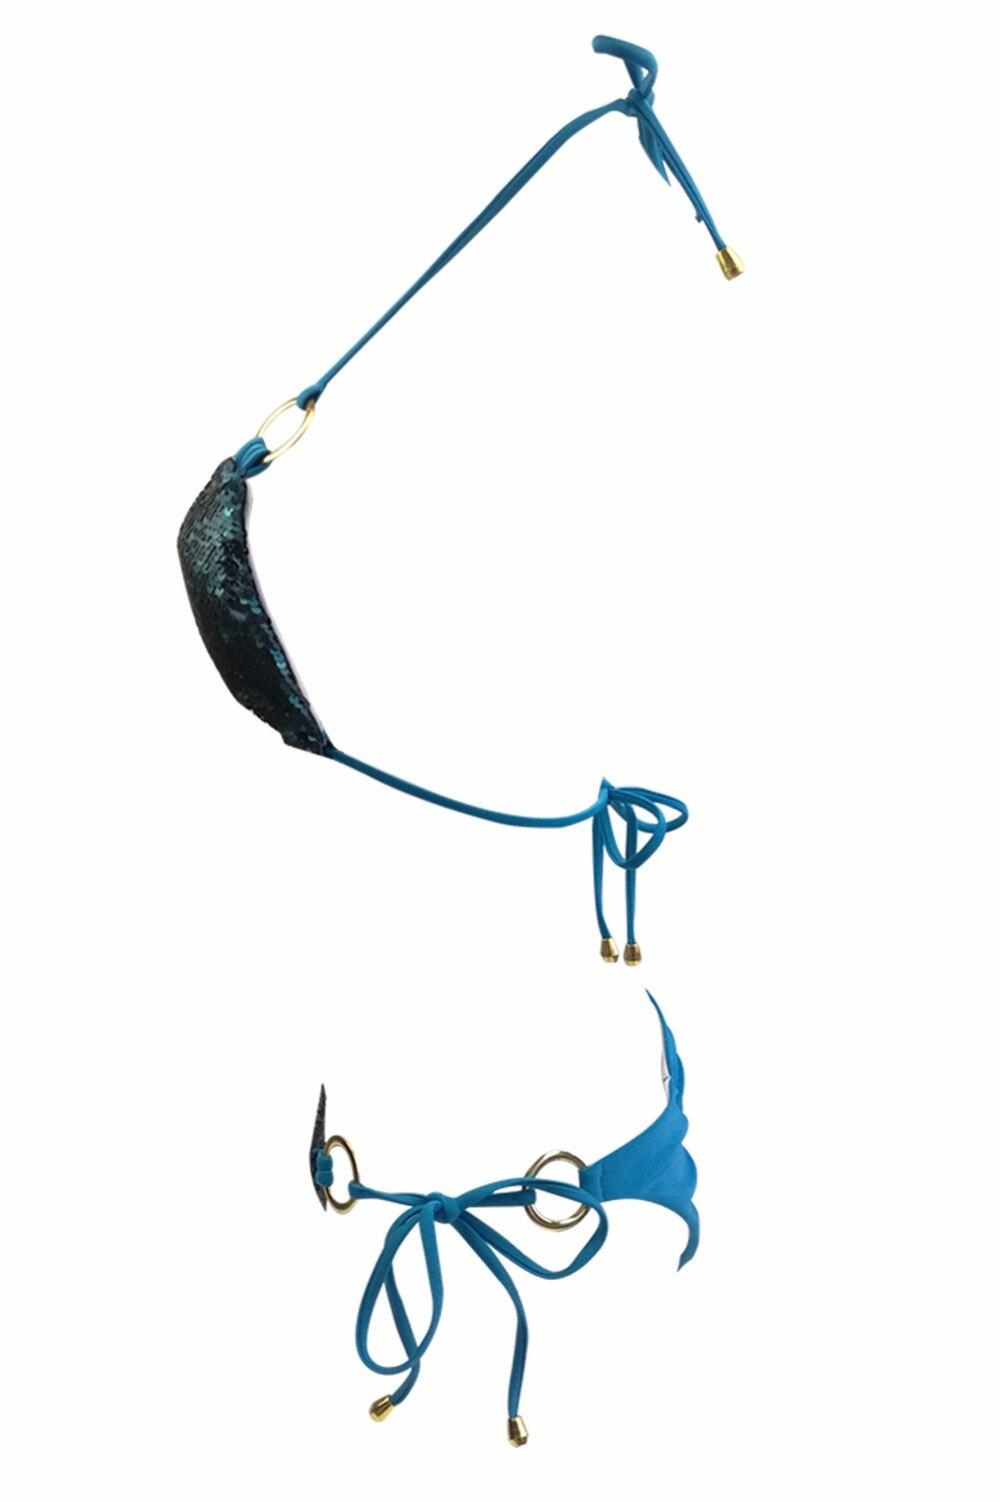 HTB1LCtNb8mWBuNkSndVq6AsApXa6 2019 Hot Sell Bikini Set Women Sexy Low Waist Bathing Suit Simple Sequins Beach Brazilian Swimsuit Halter Bandage Swimwear